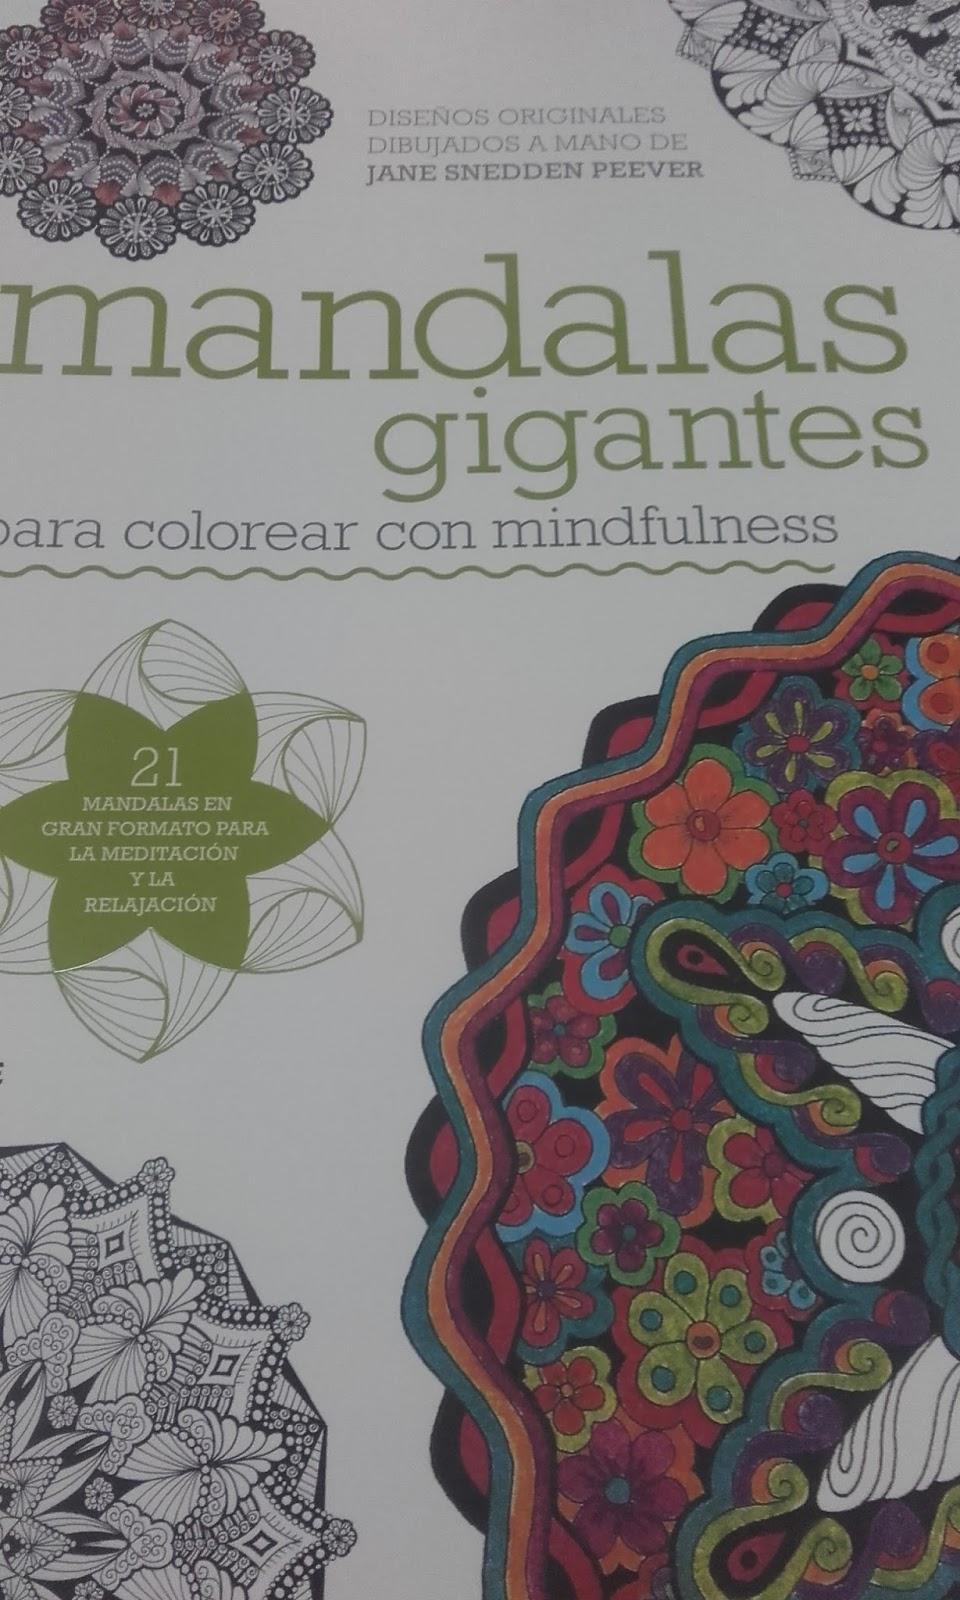 MANUALIDADES SIMBOLOS: LIBROS PARA COLOREAR, MANDALAS